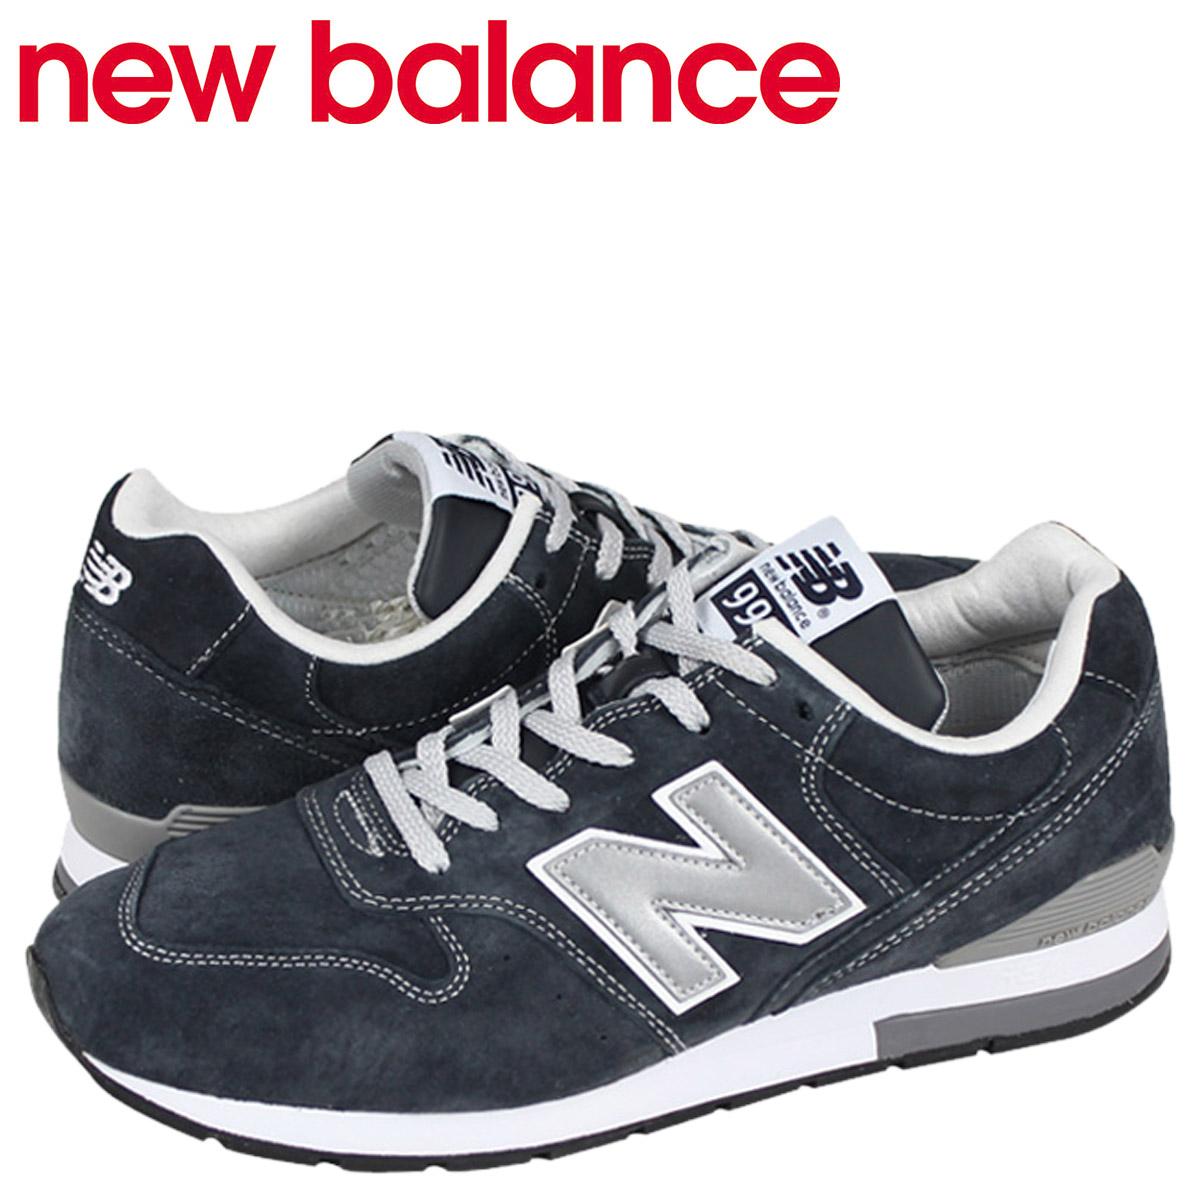 new balance mrl996em